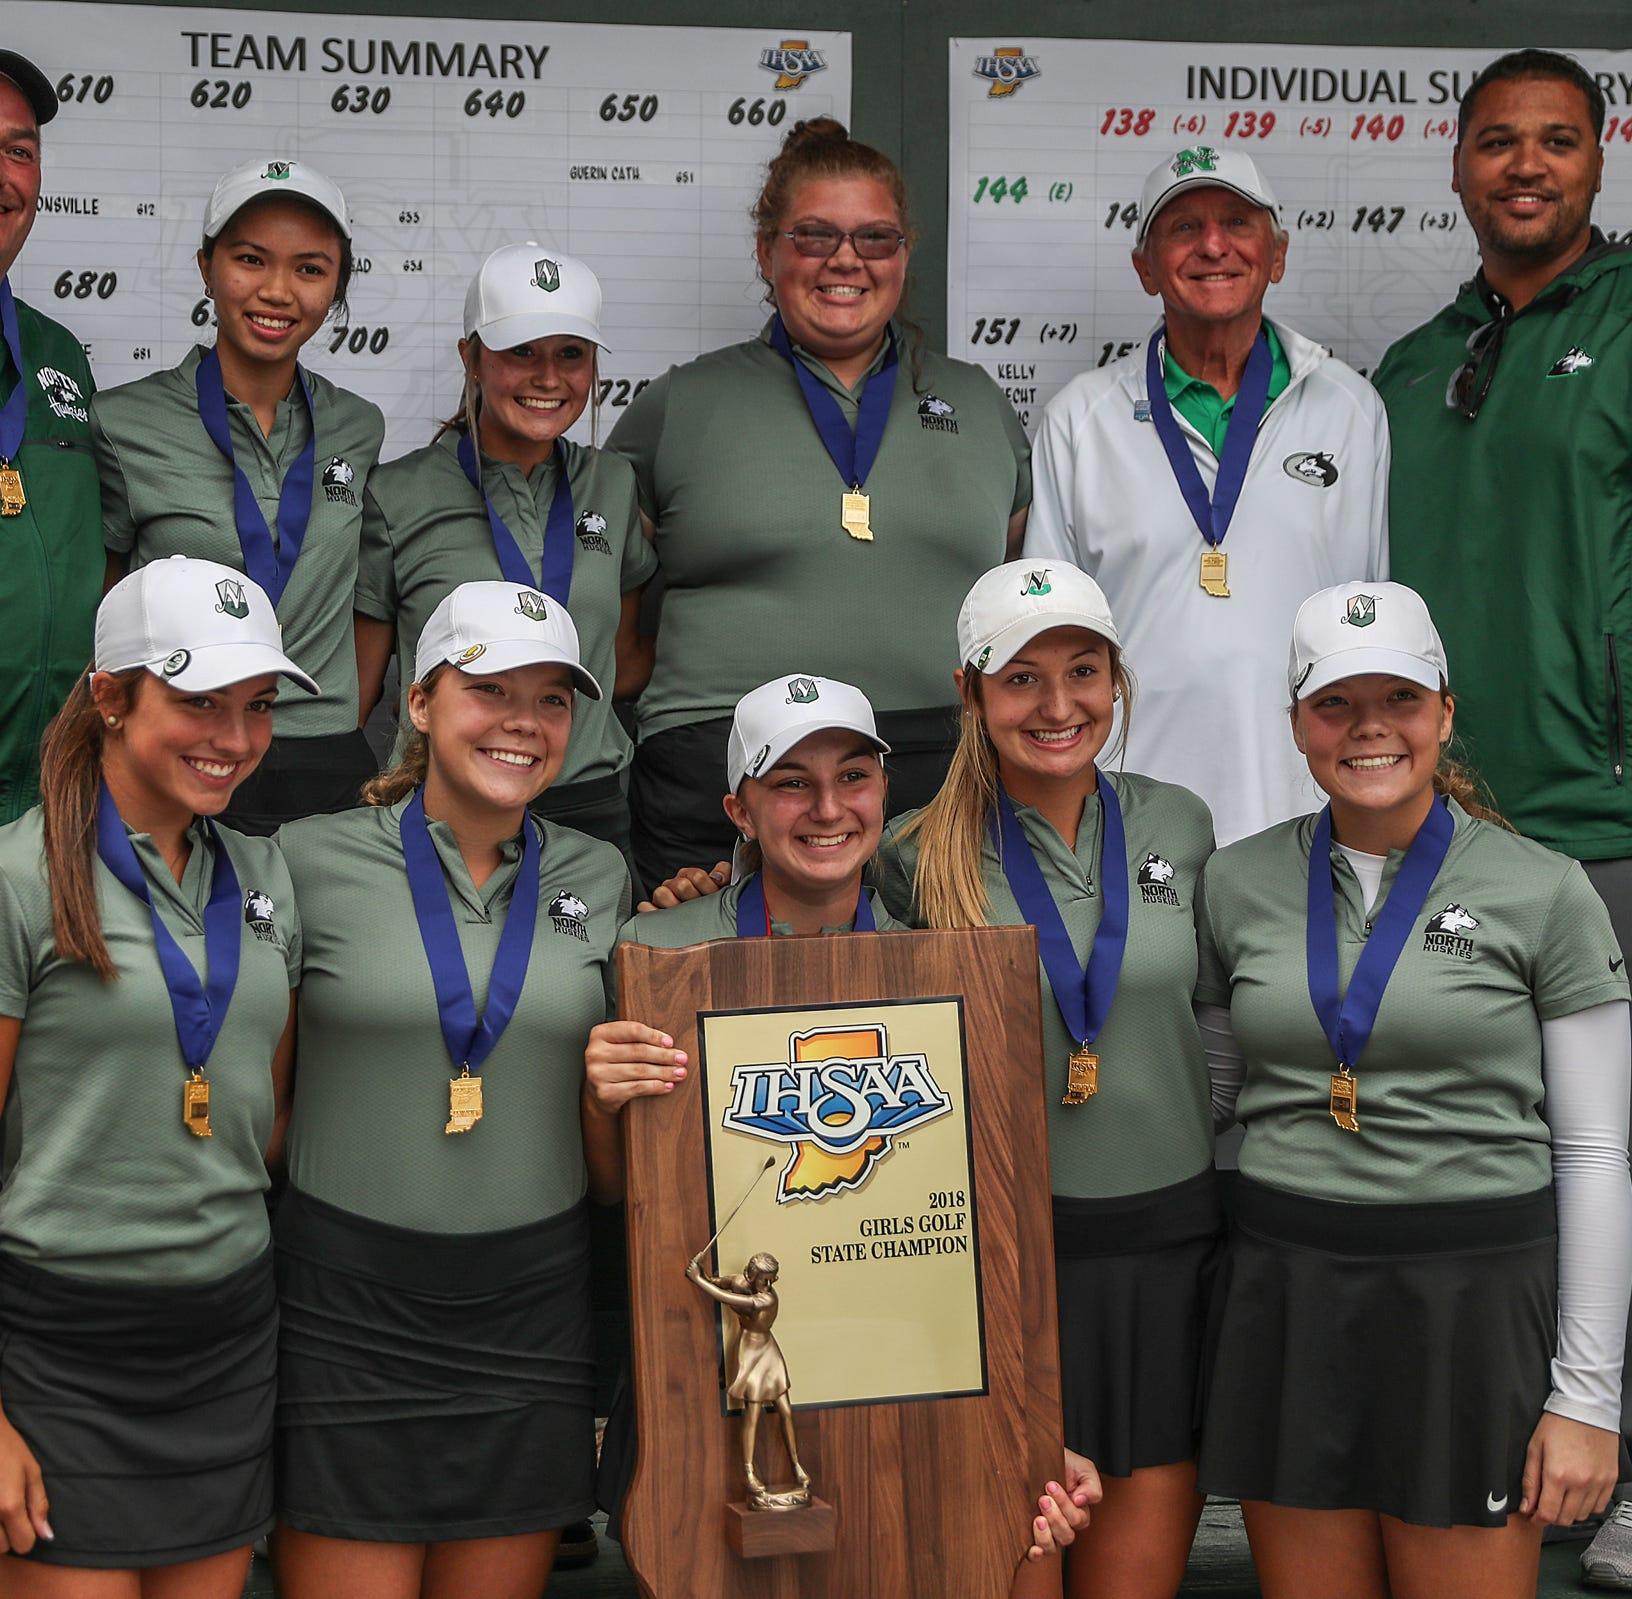 North girls golf lights up back nine to win state championship